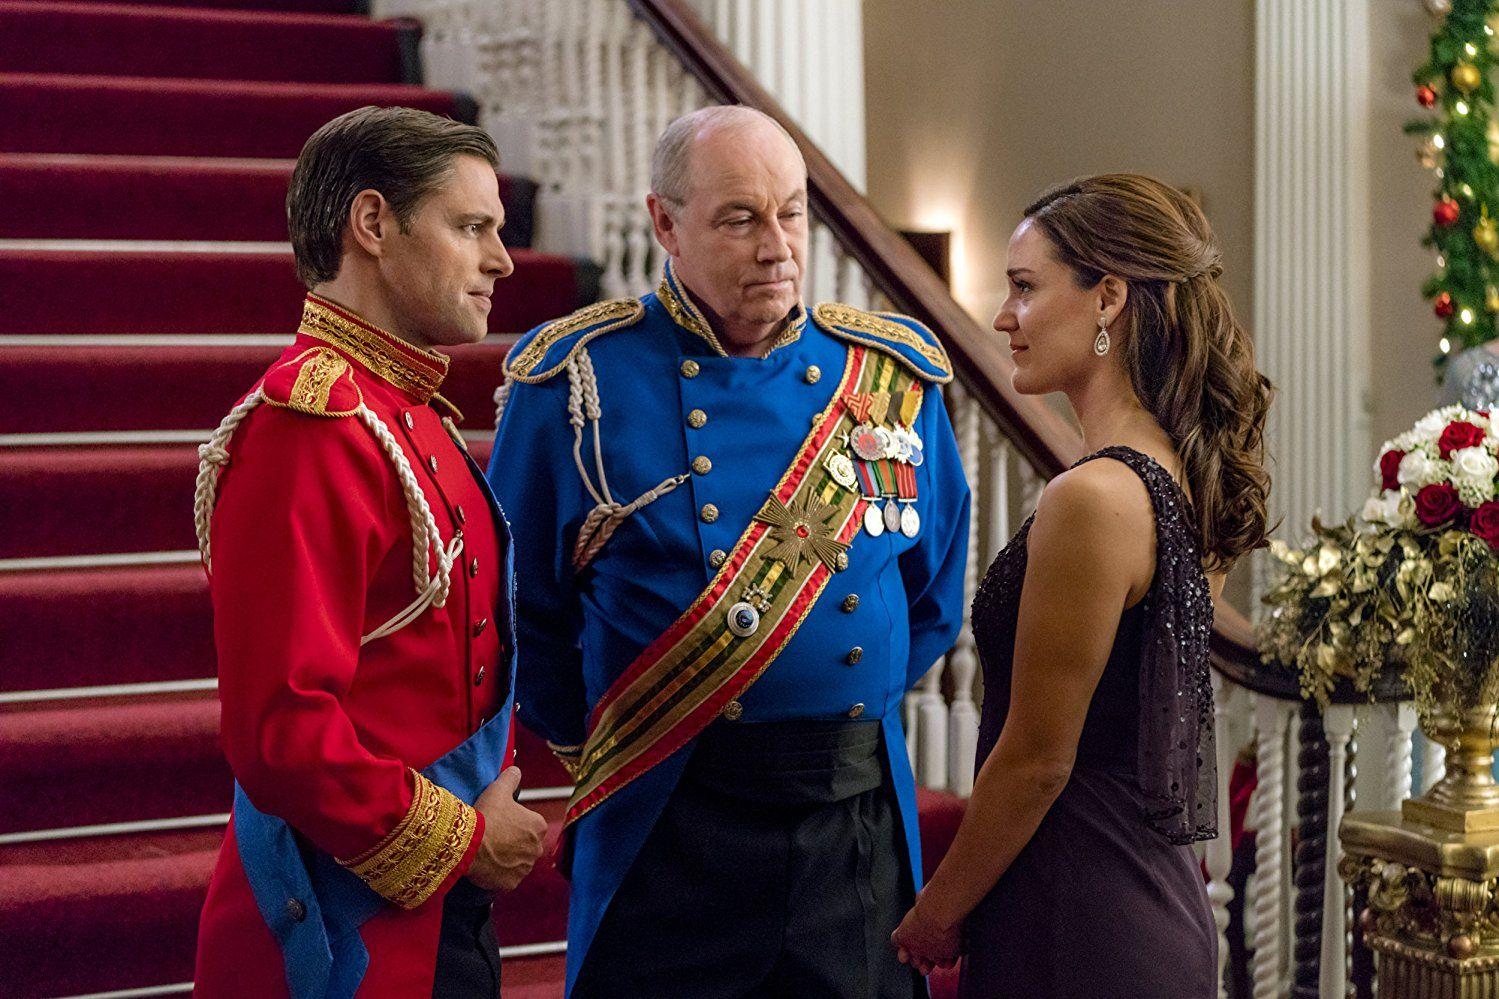 a royal new year's eve hallmark Movie stars, Family